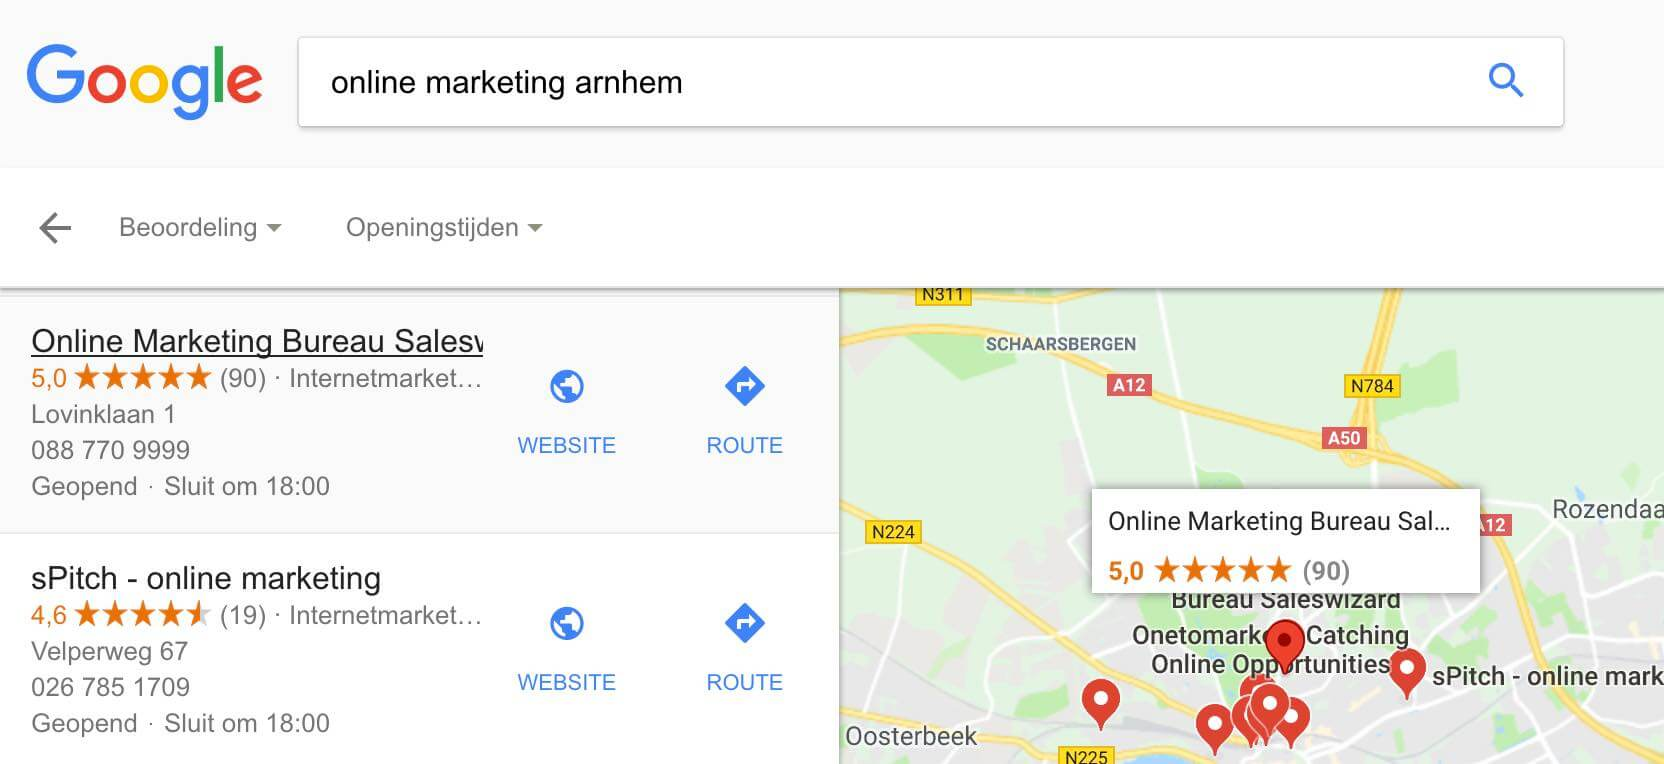 Online Marketing Arnhem